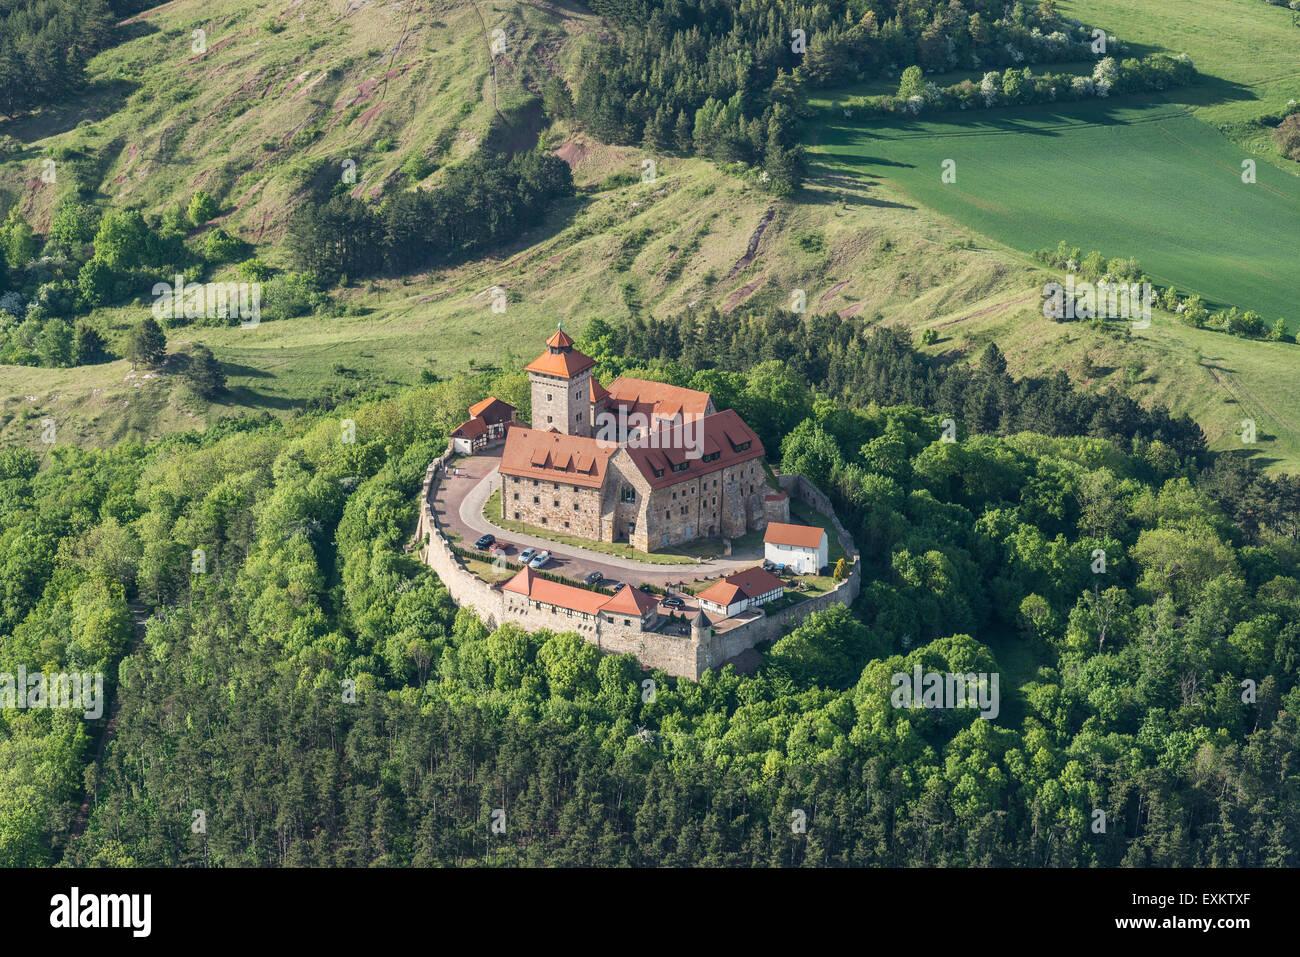 Wachsenburg Castle, Thuringia, Germany - Stock Image